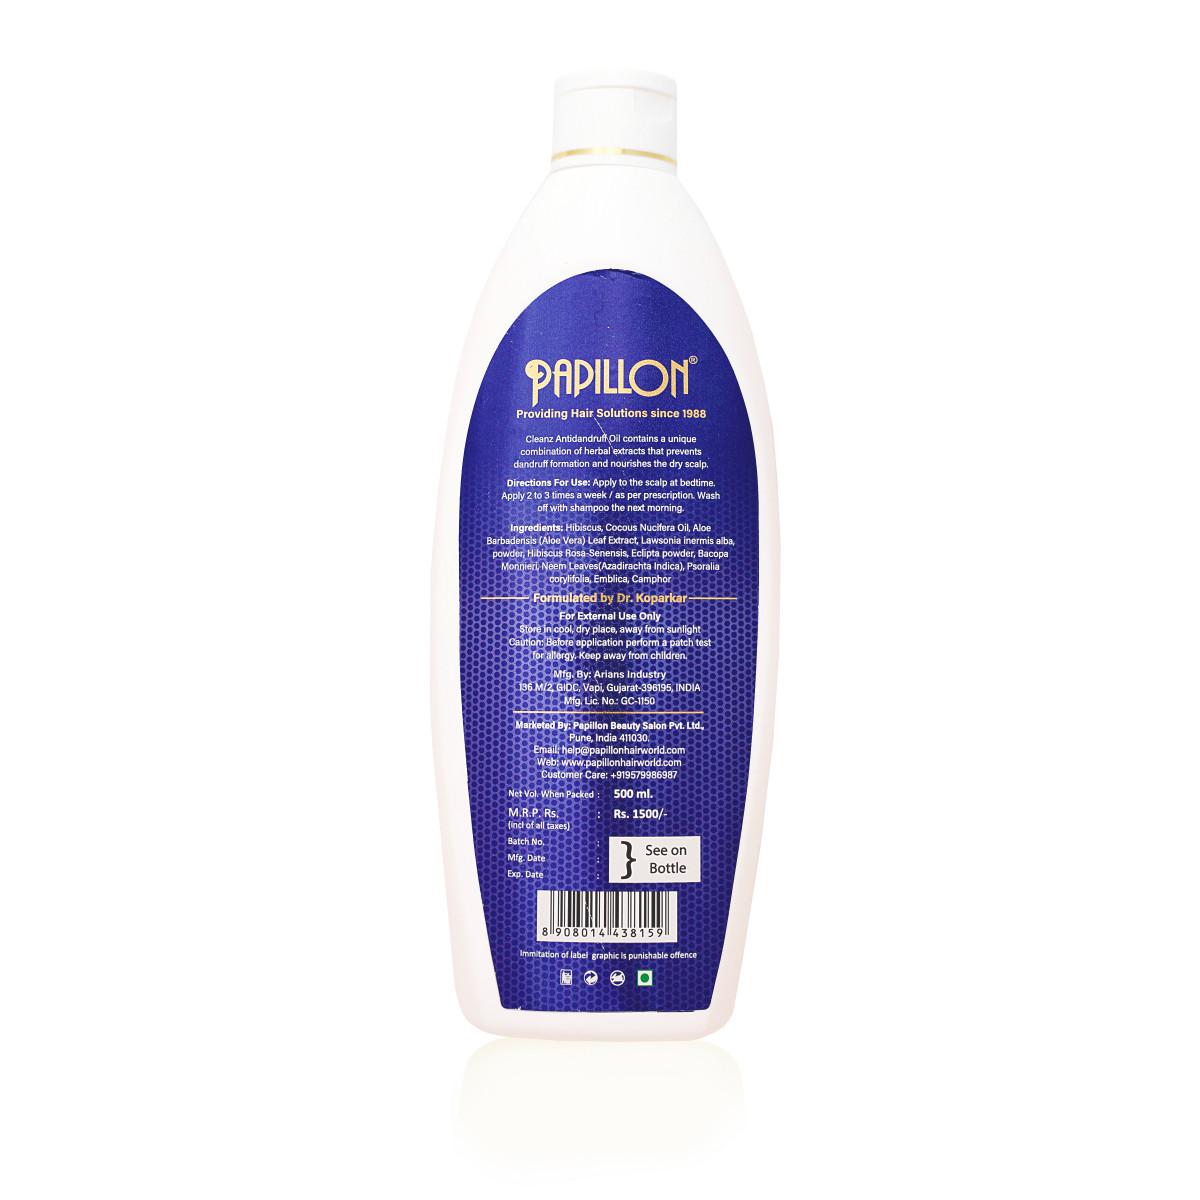 Cleanz Antidandruff Hair Oil - Large